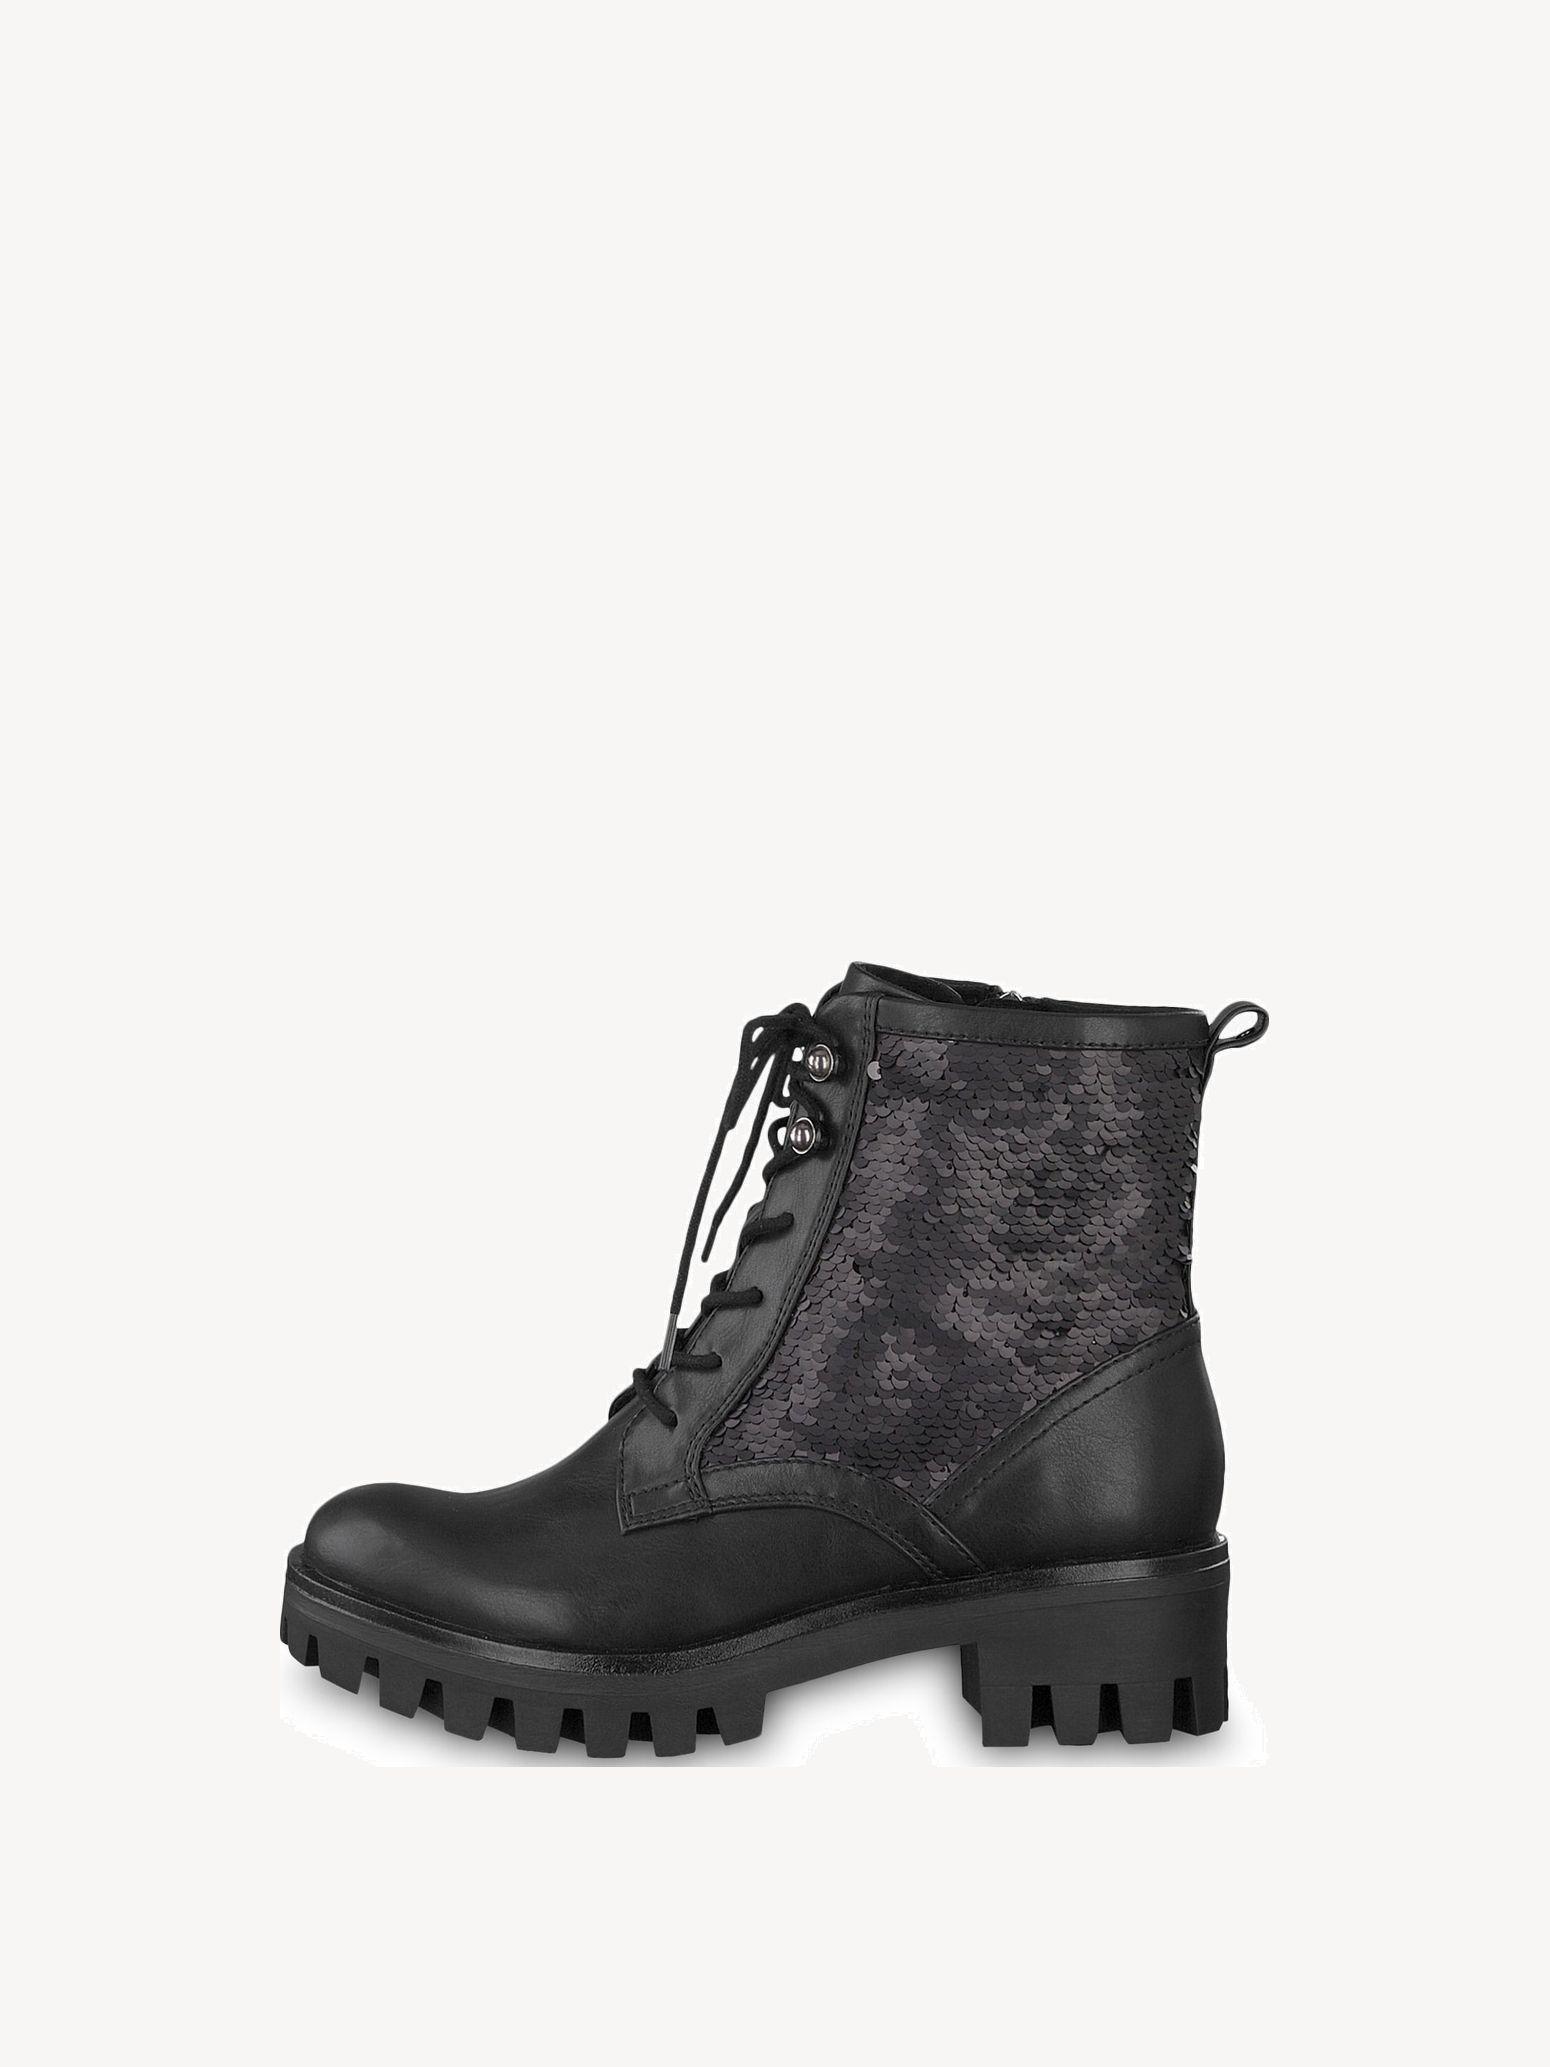 d95f7d58f0c Rbulu 1-1-25278-21: Buy Tamaris Booties online!